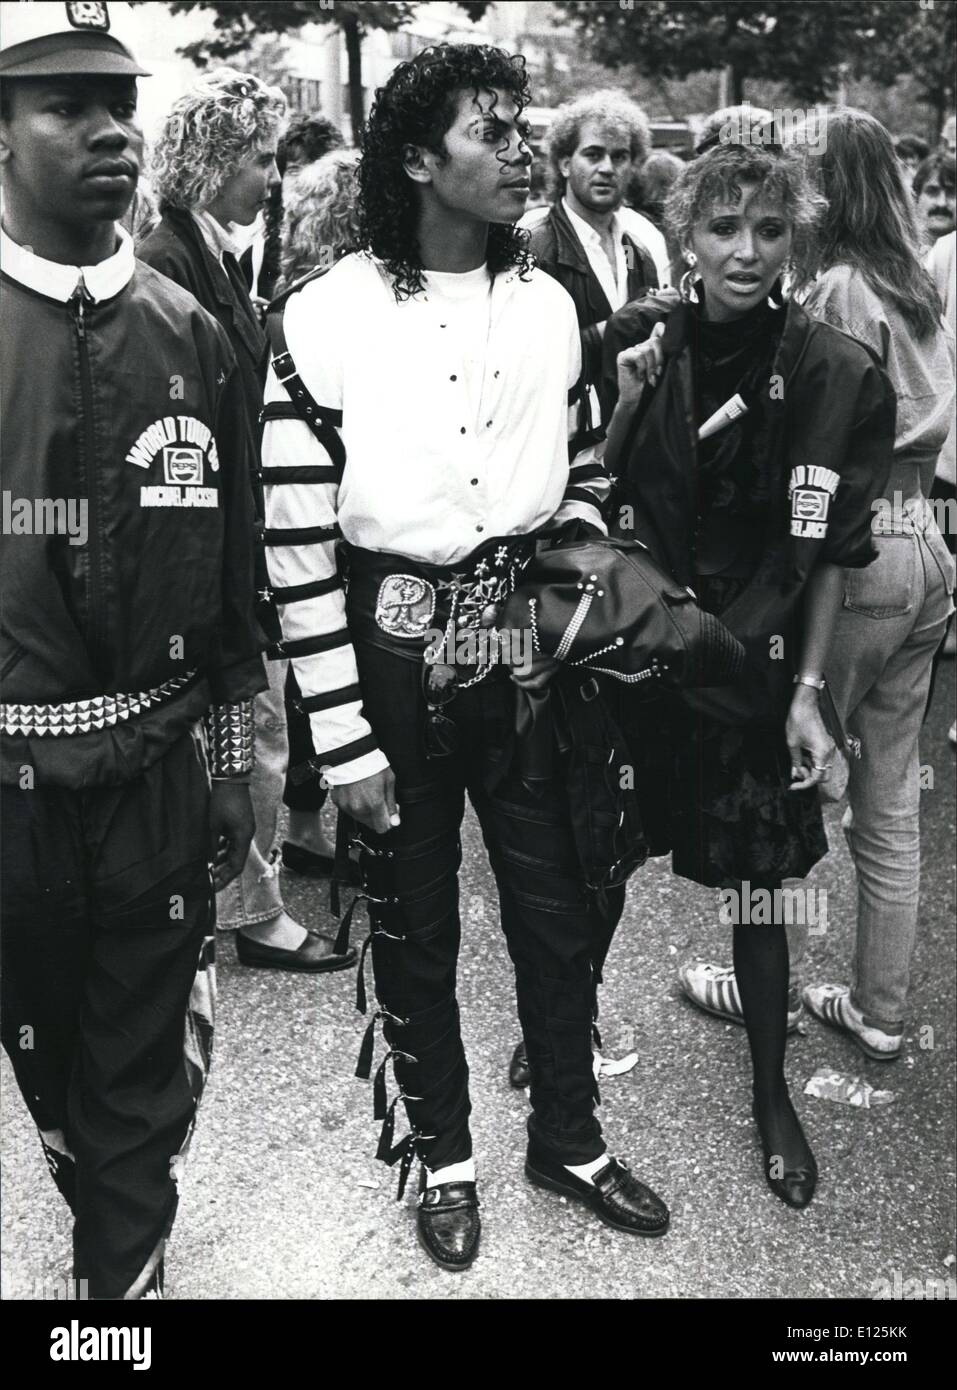 Apr. 04, 1988 - Michael Jackson